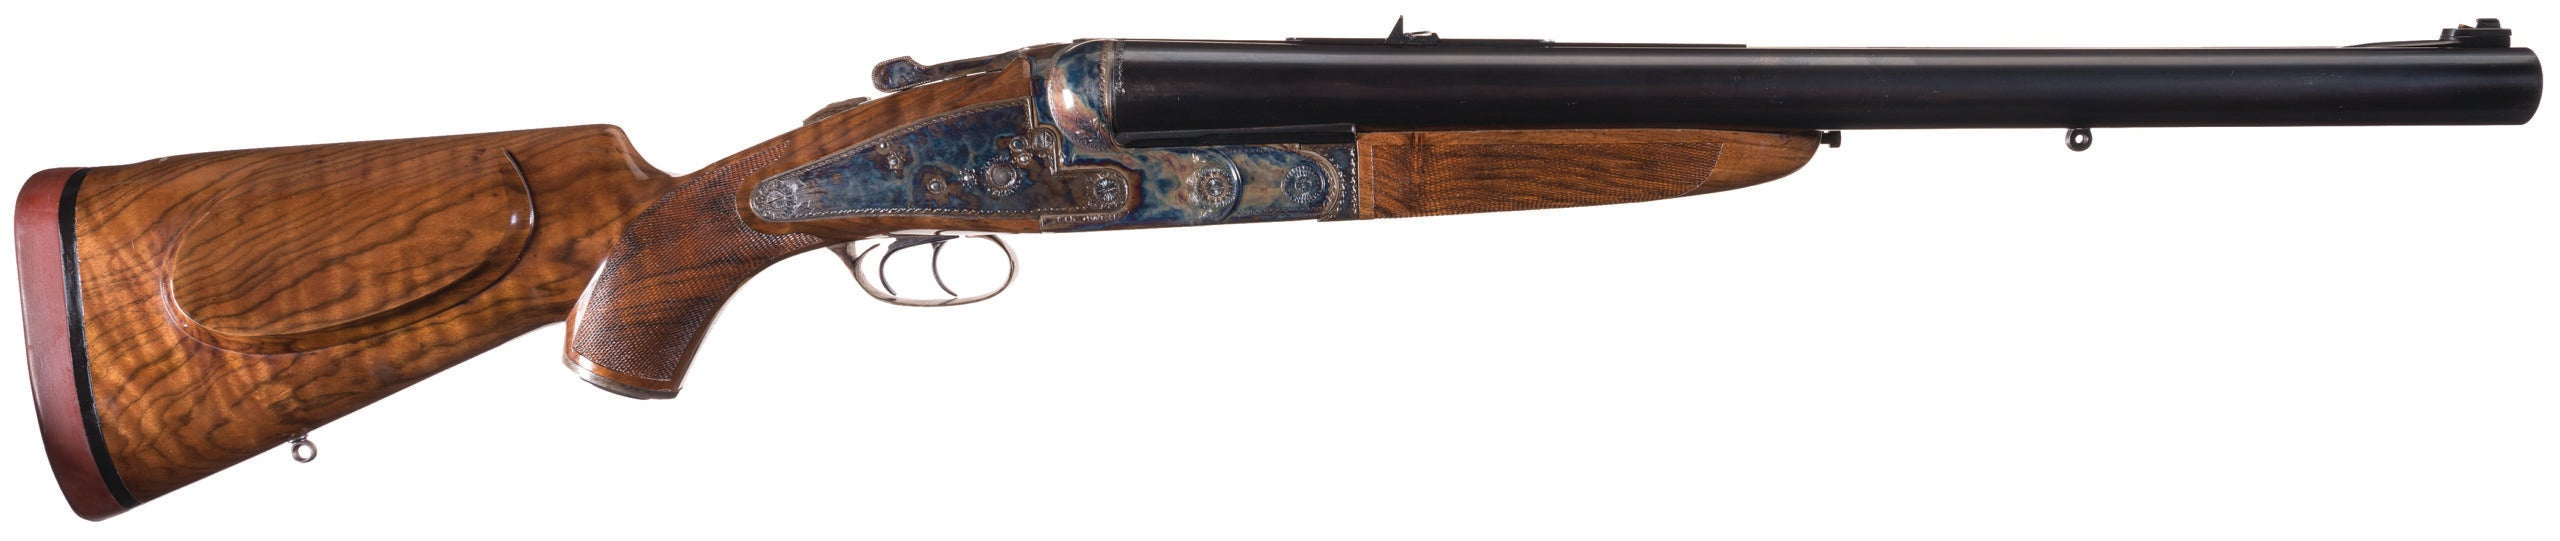 Ken Owen 4-bore rifle